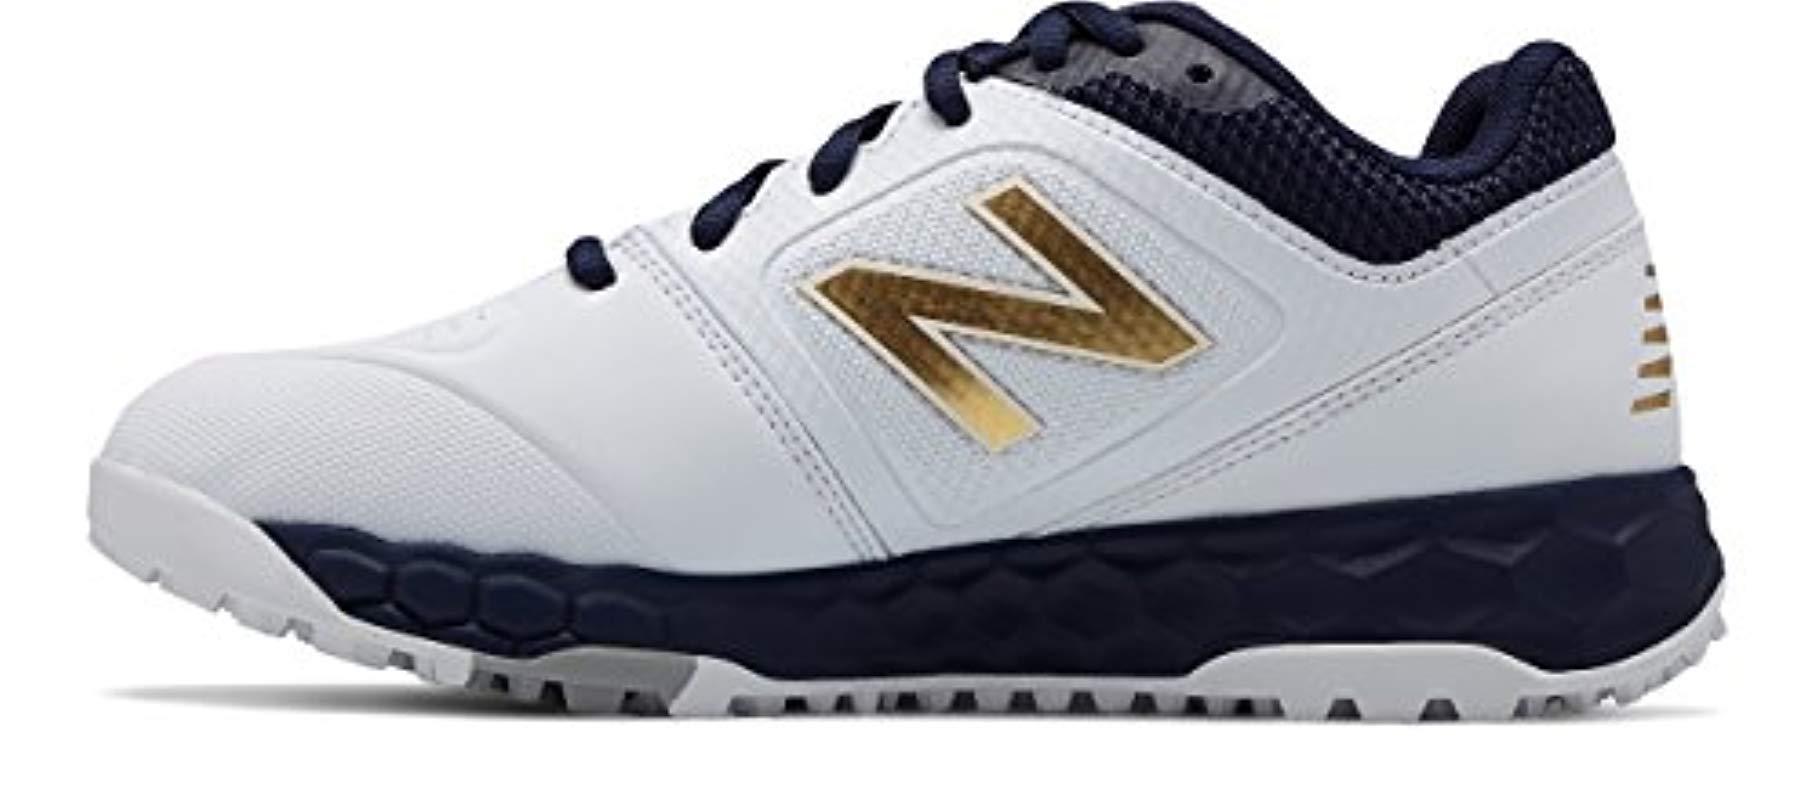 512f62b1a New Balance - Blue Velo V1 Turf Softball Shoe Navy white 11 B Us -. View  fullscreen